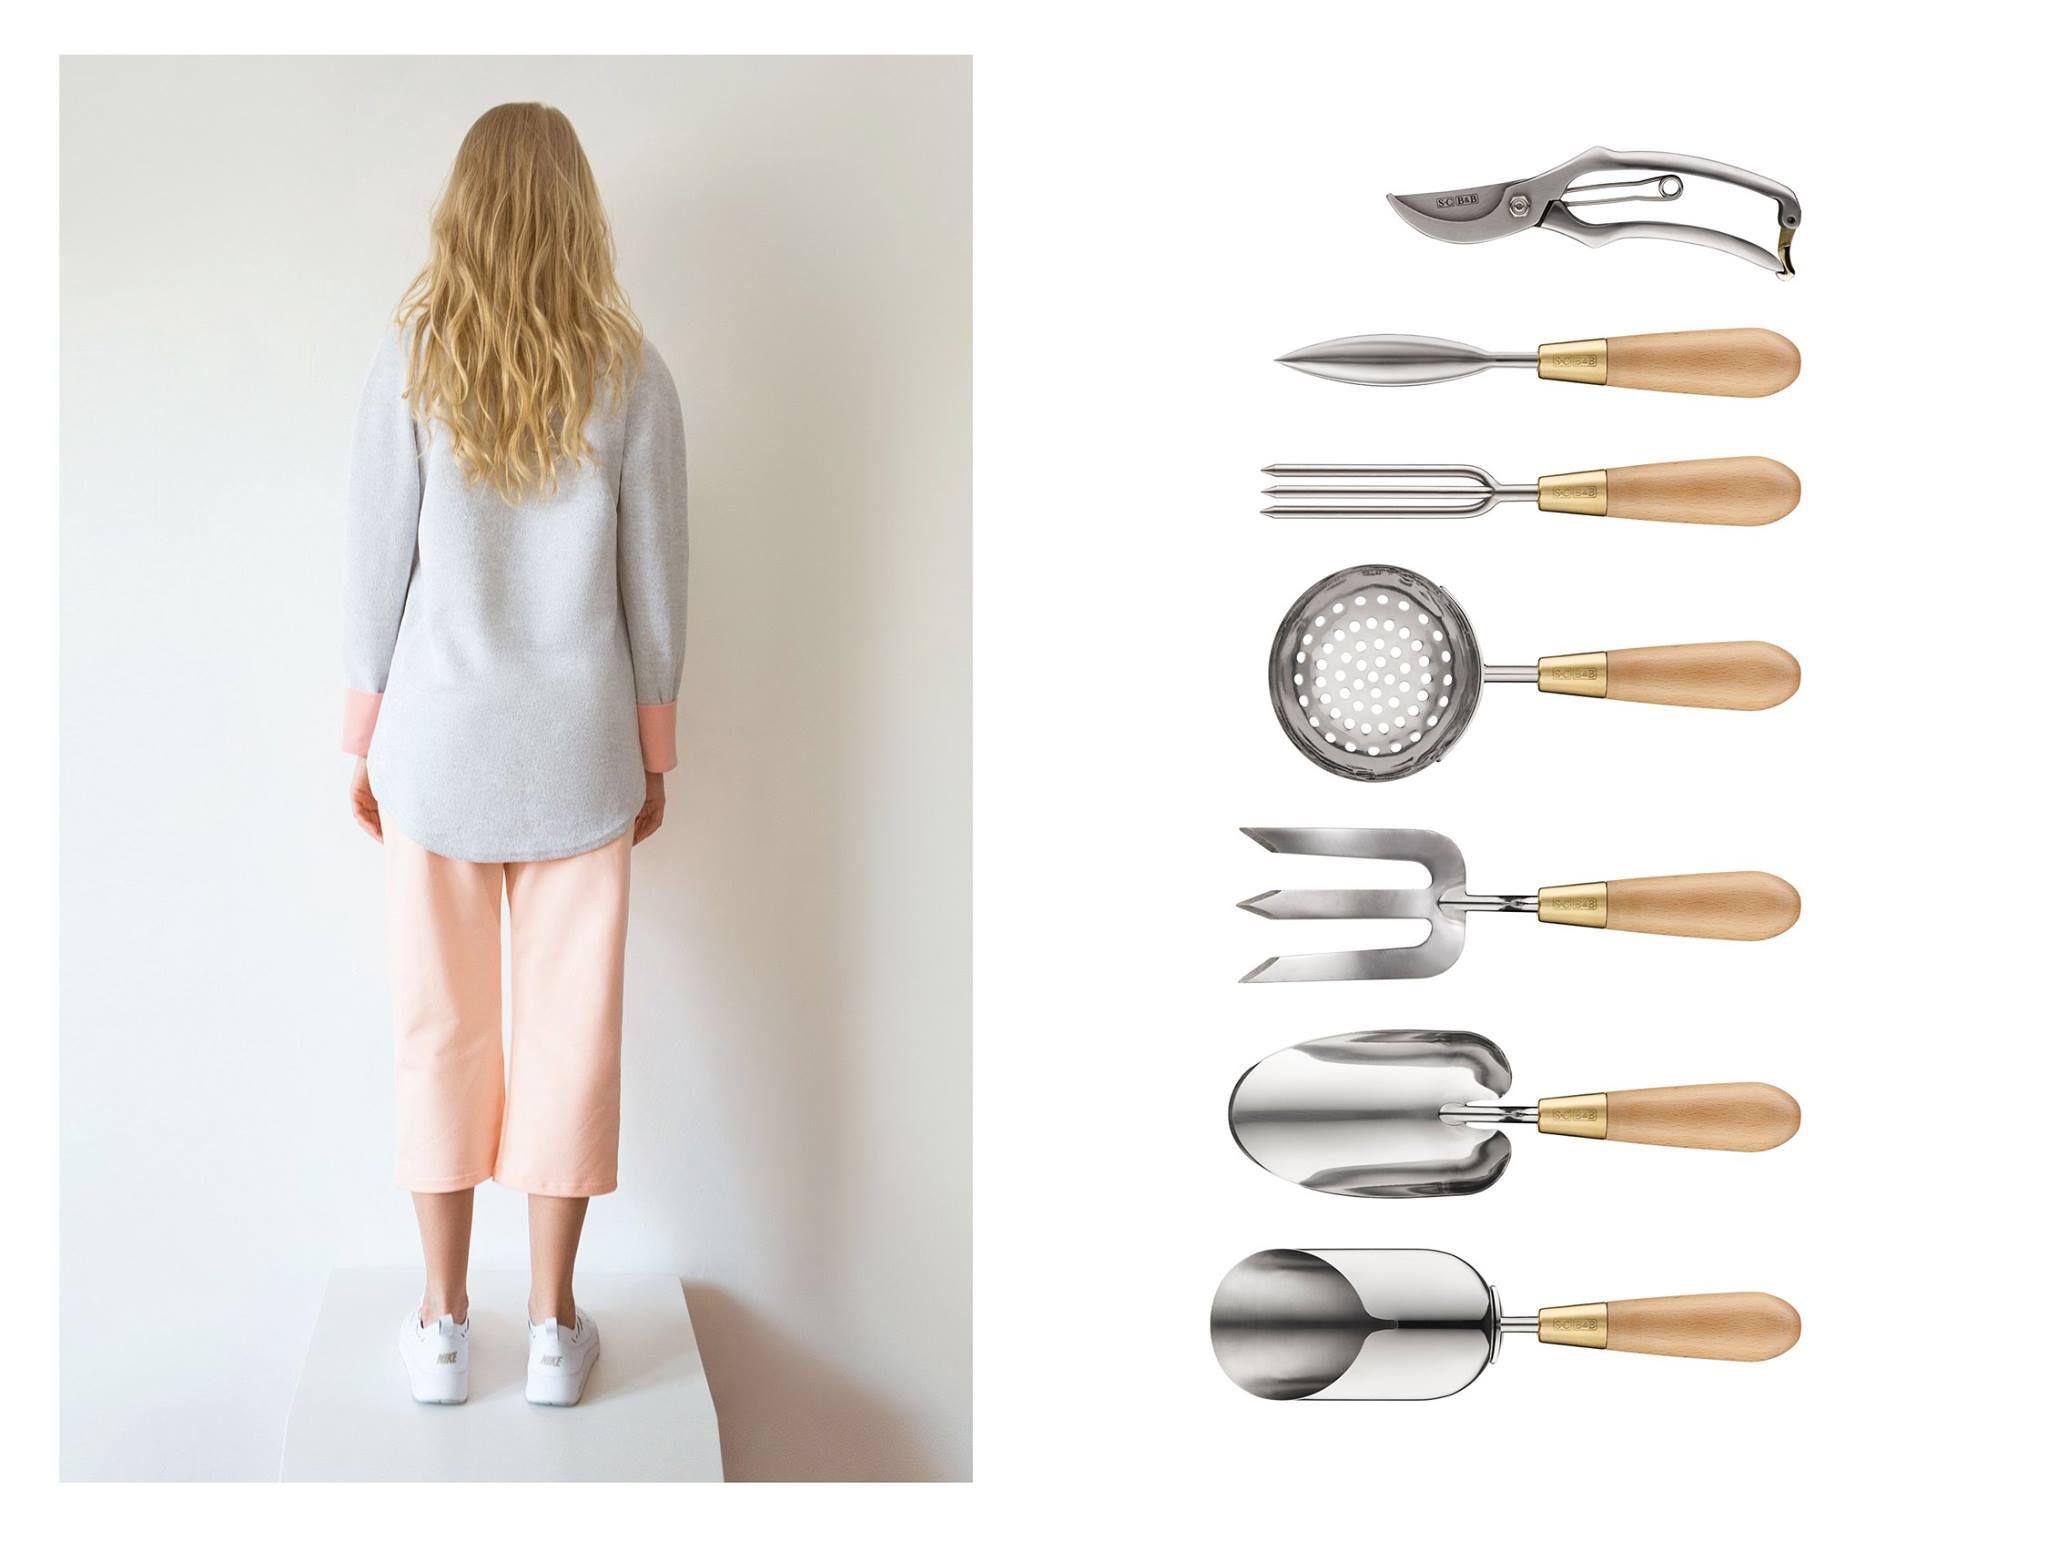 handmade clothes trousers peach textile